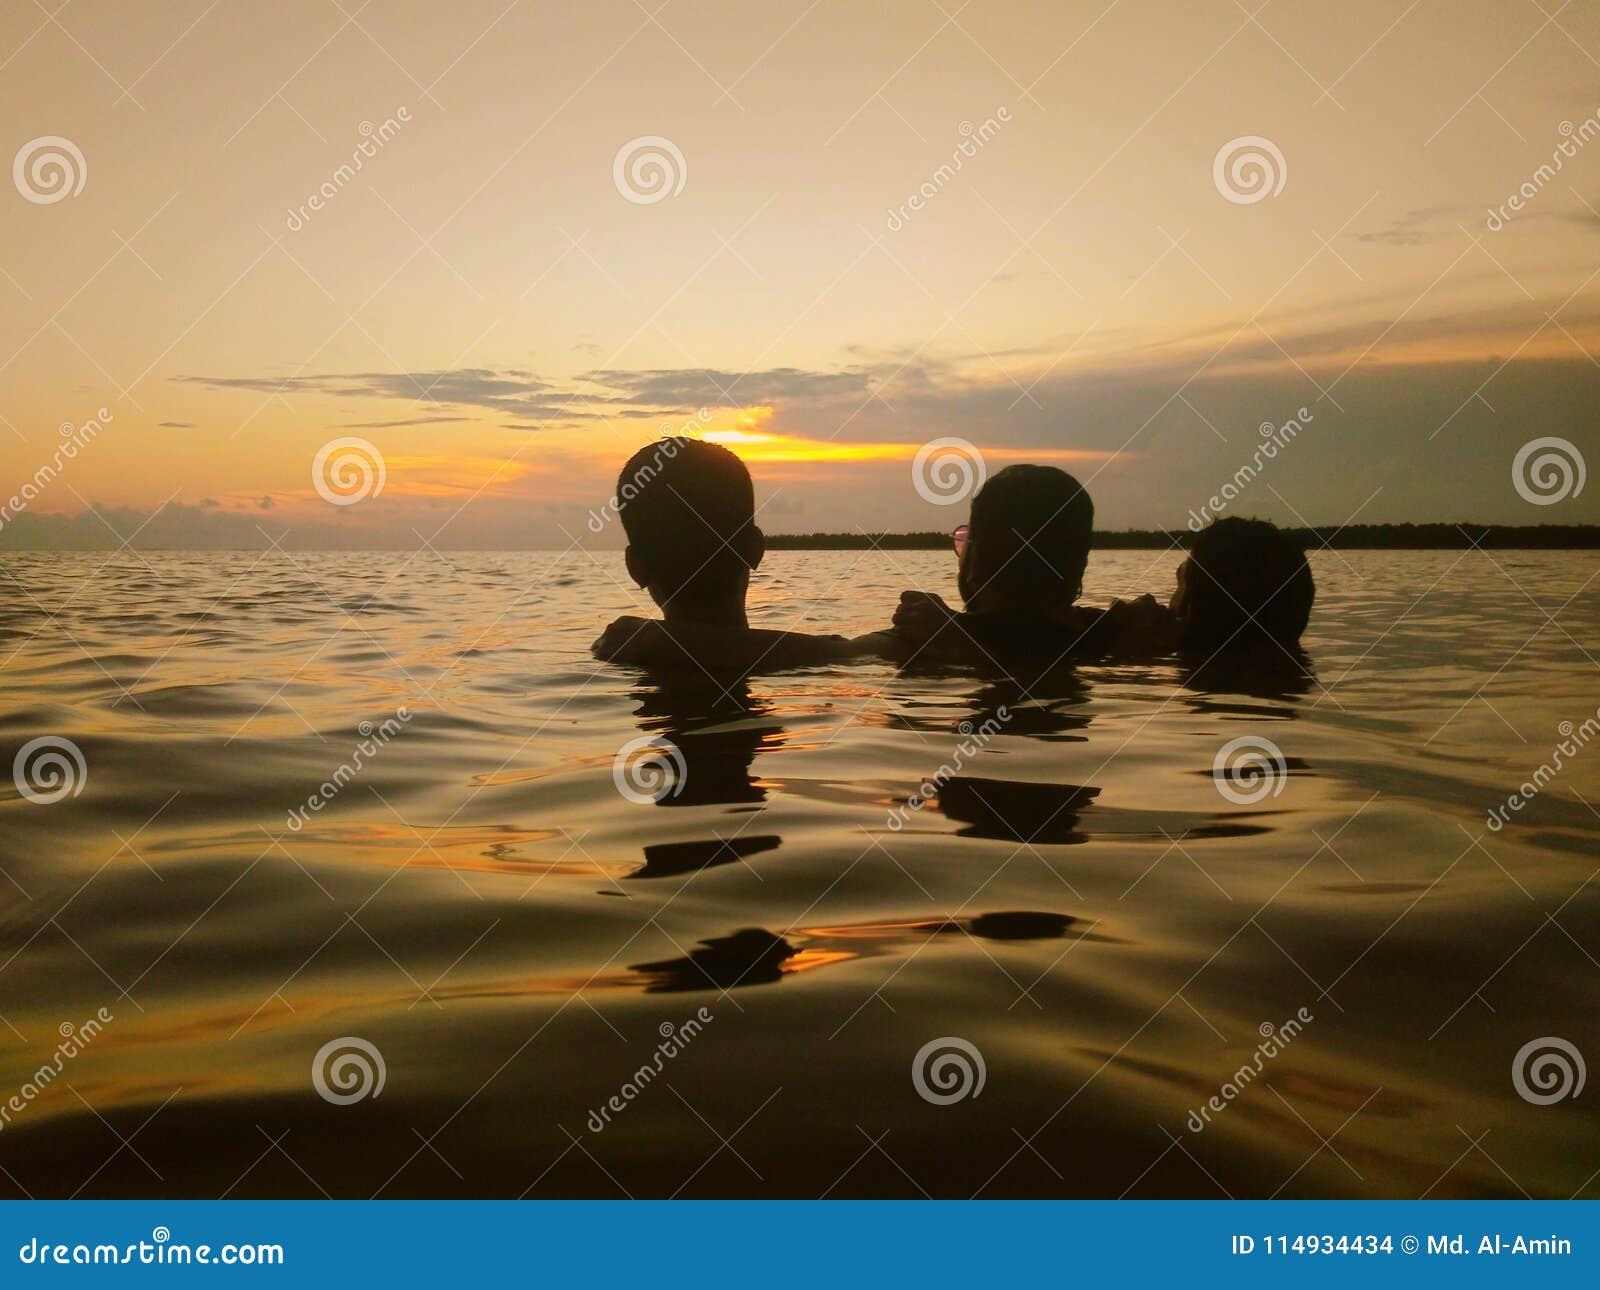 Sun bath on sea.